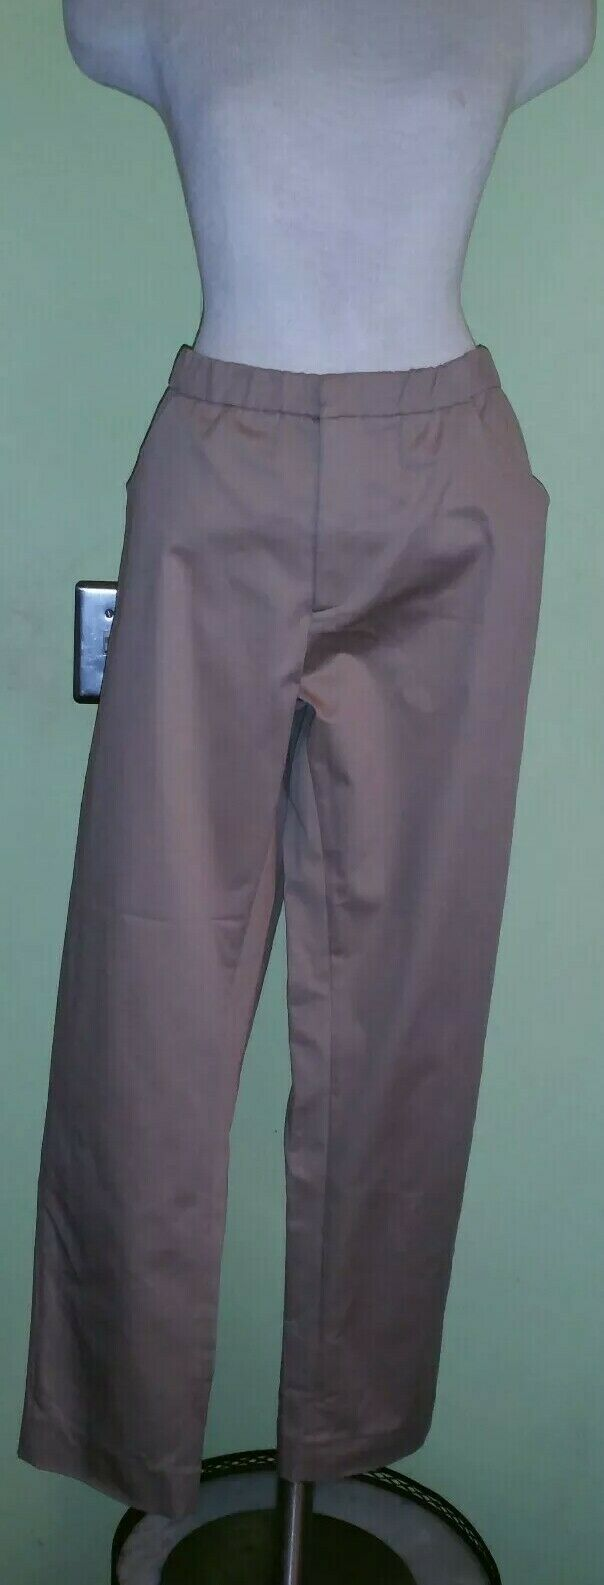 Marni Tan Cotton Pants Sz 8 NWT  625 PAMAL03A00 soft cotton drill cropped  ankle